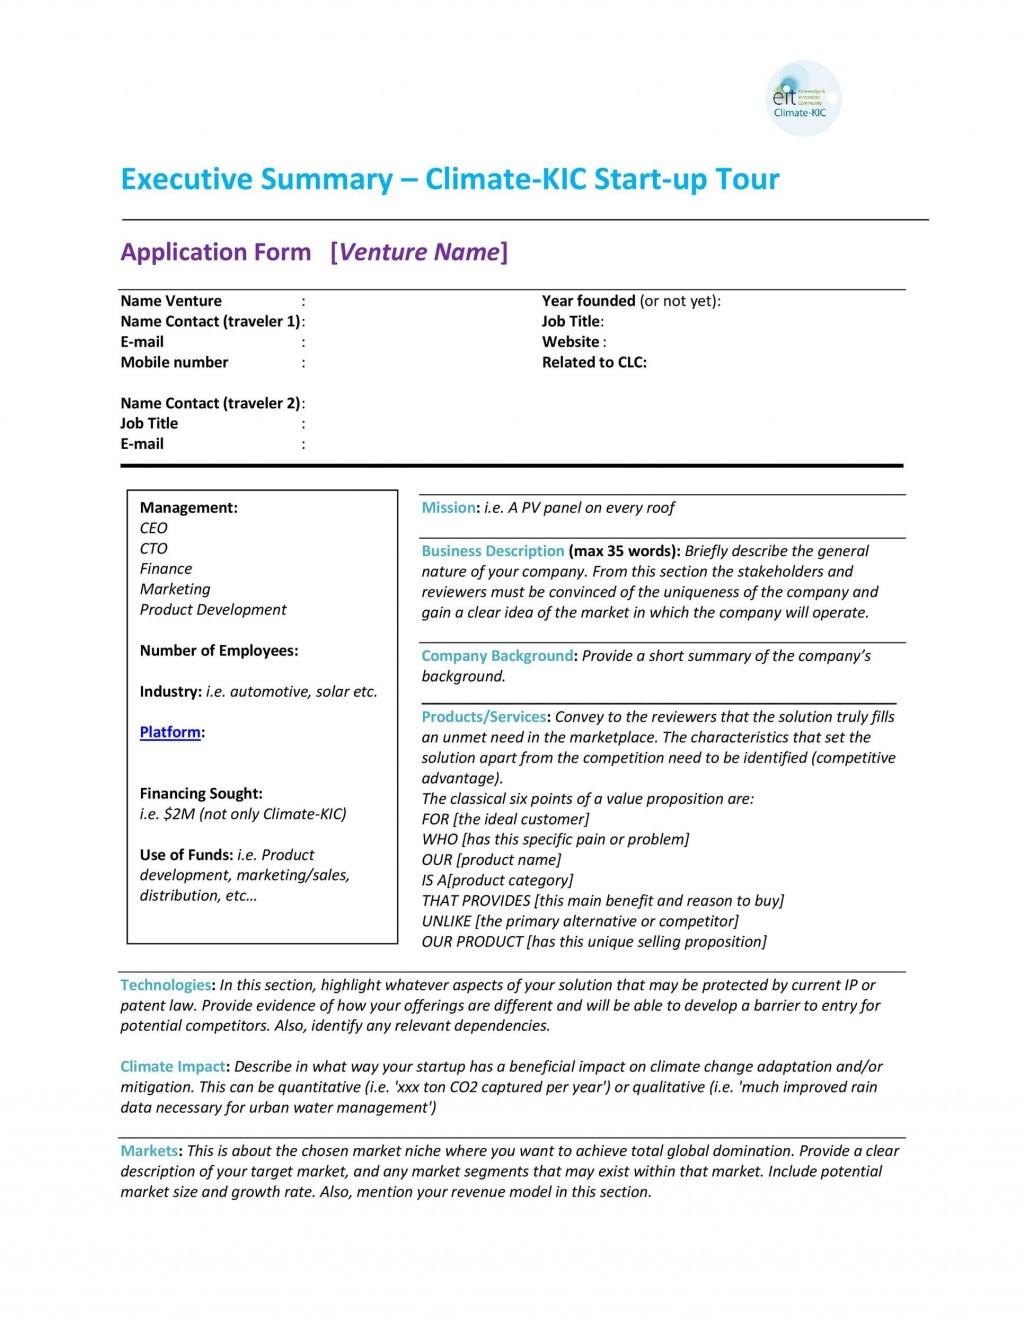 006 Incredible Executive Summary Template Word Free Idea Large